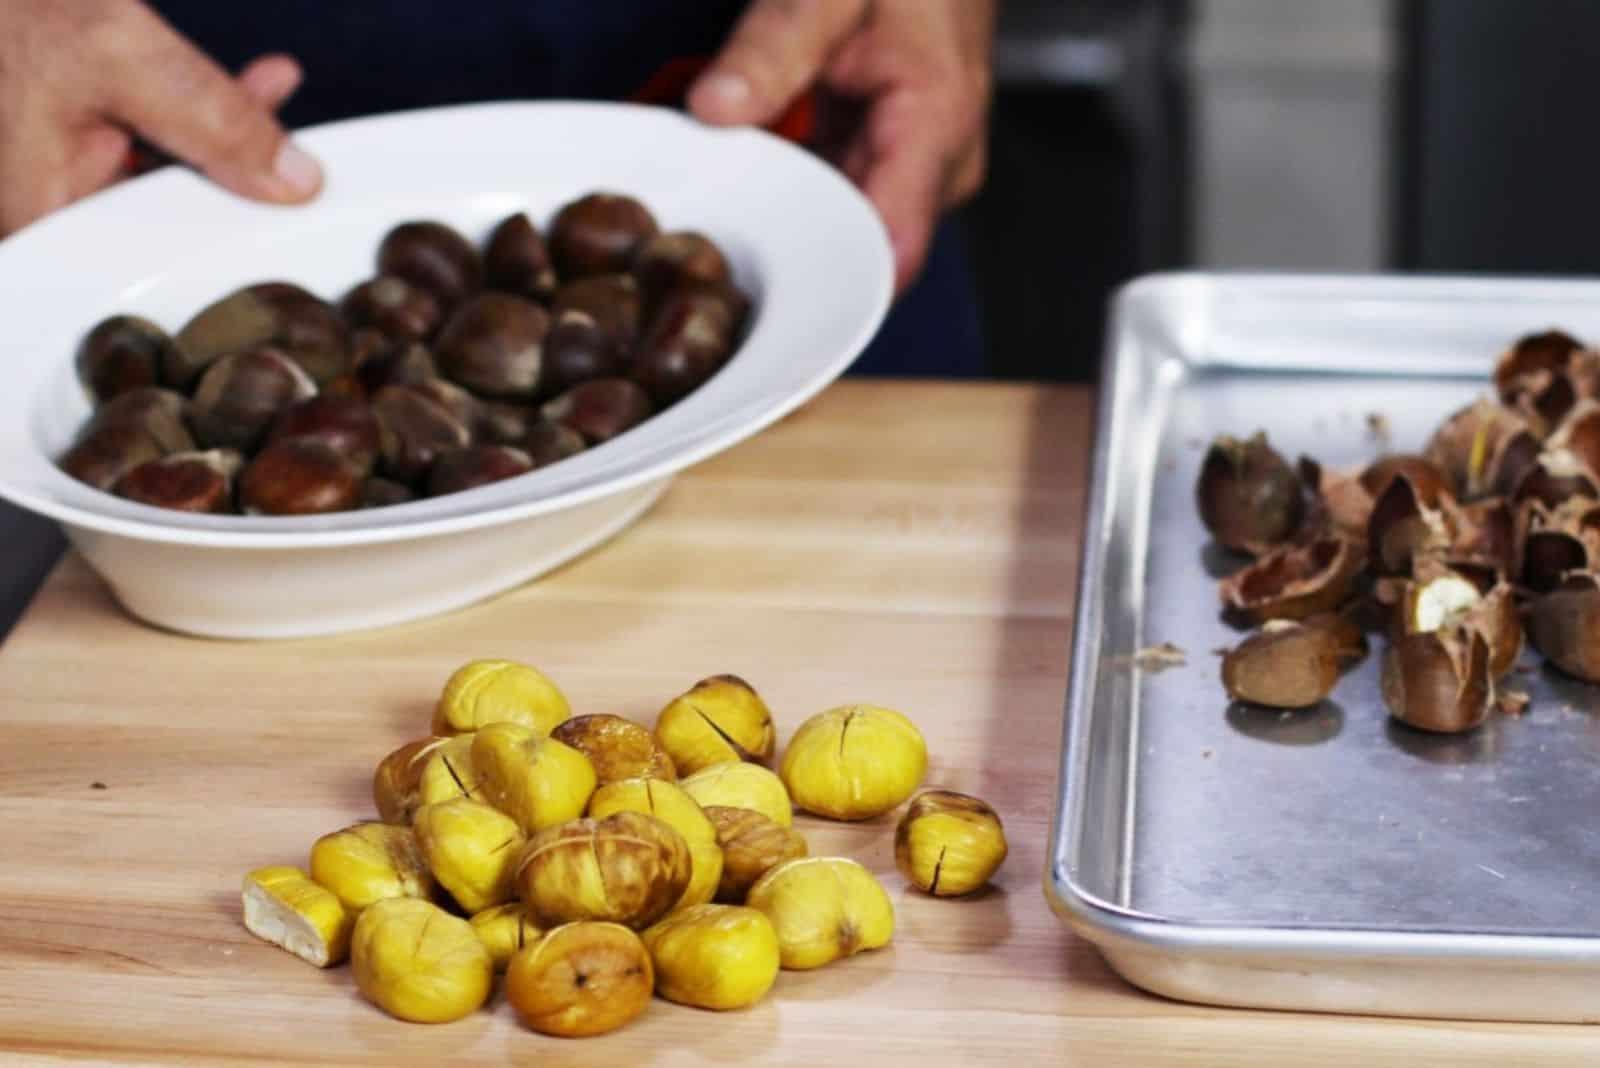 a person prepares a chestnut